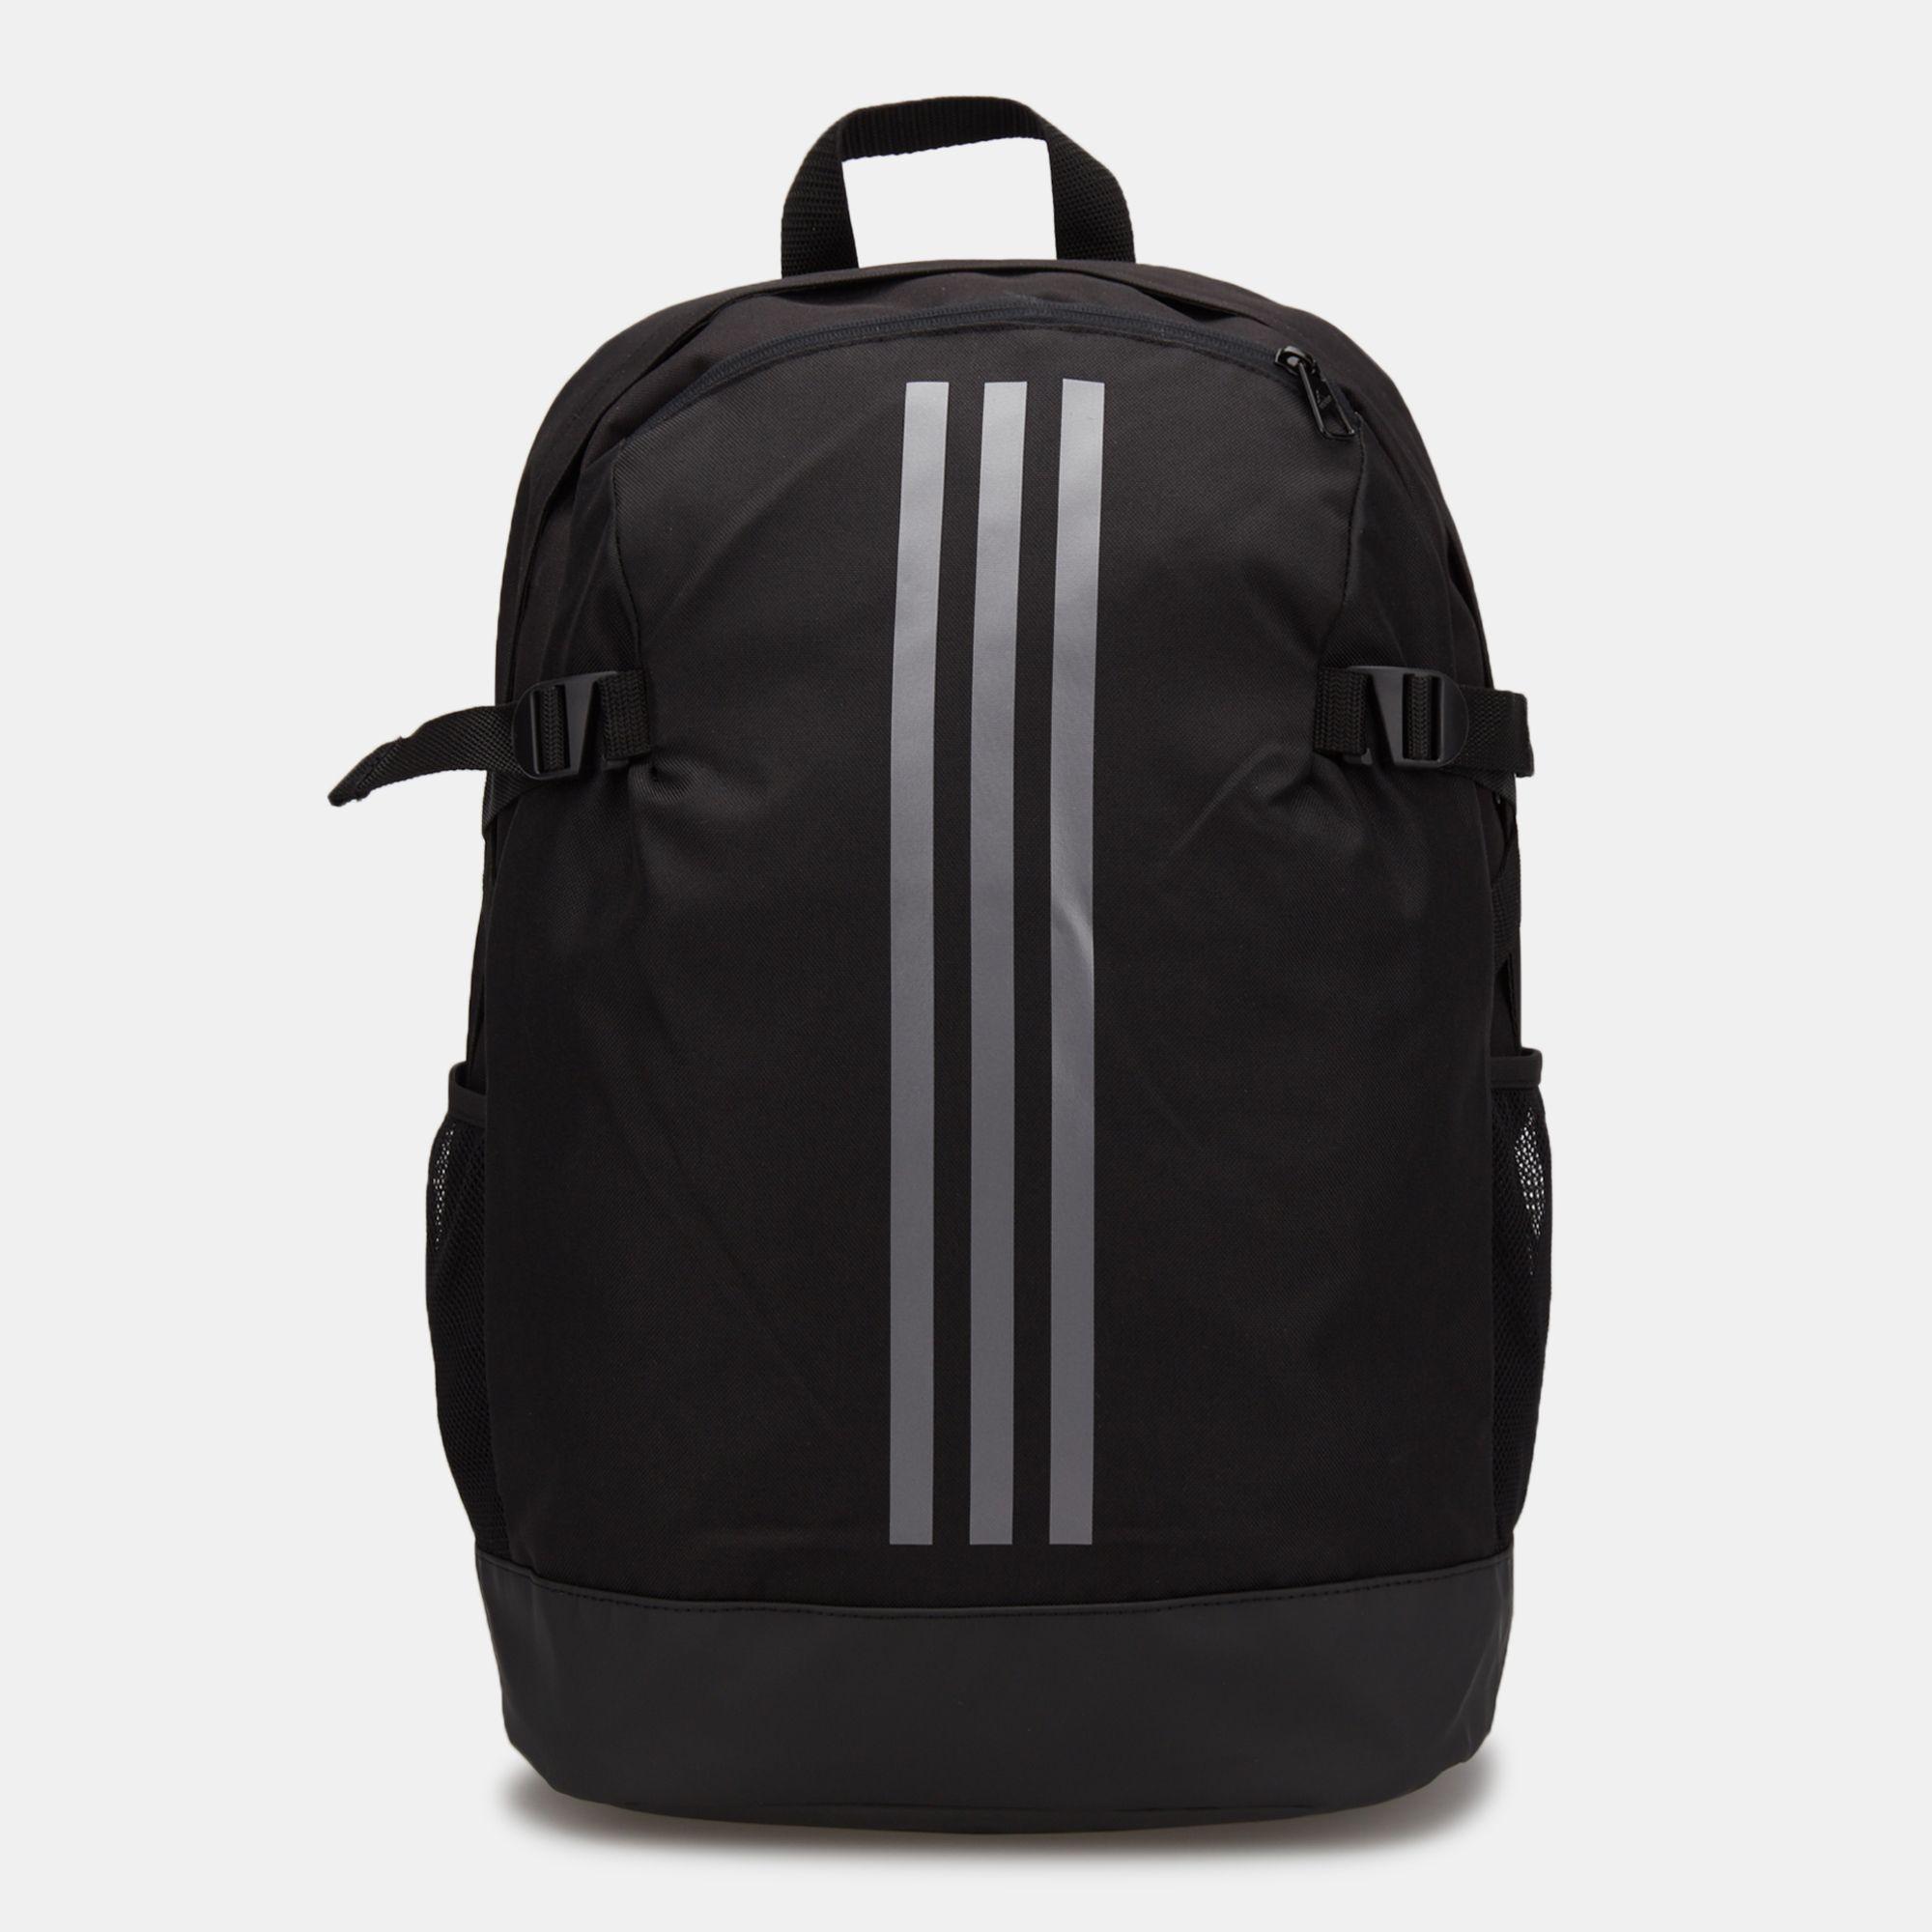 a4ae02bba0 adidas Power 4 Loadspring Backpack | Backpacks and Rucksacks | Bags ...